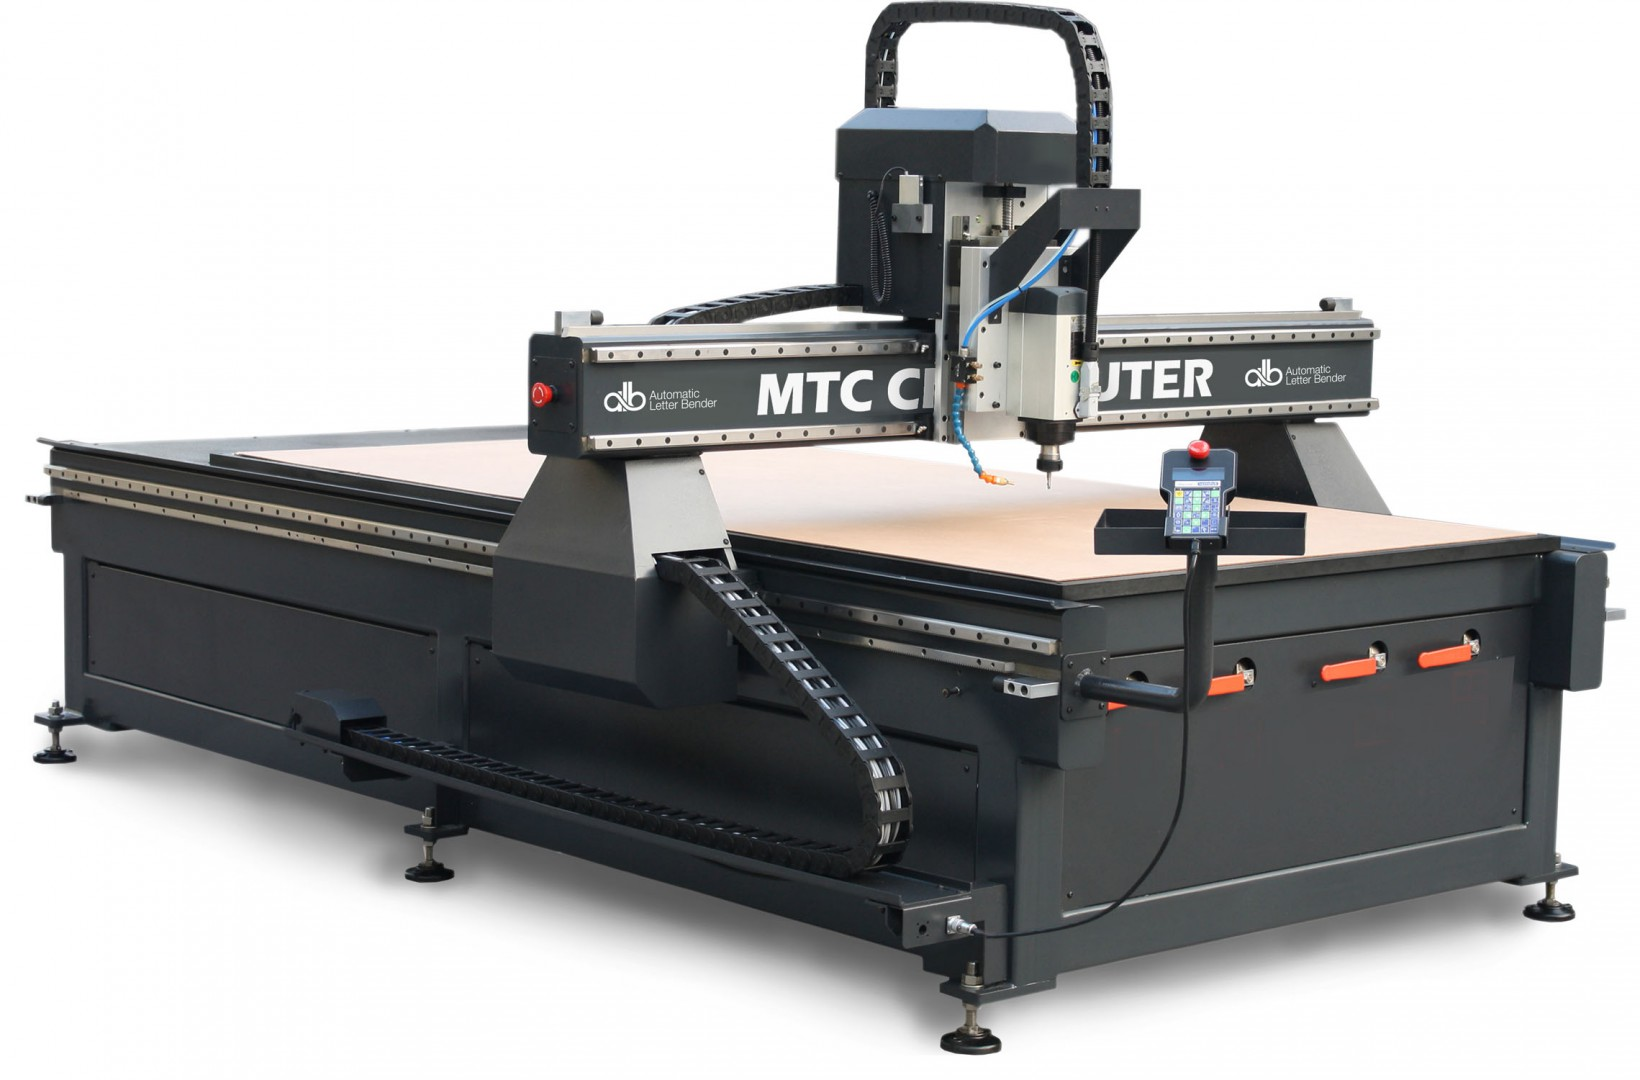 ALB-CNC ROUTER MTC (Manual Tool Change)